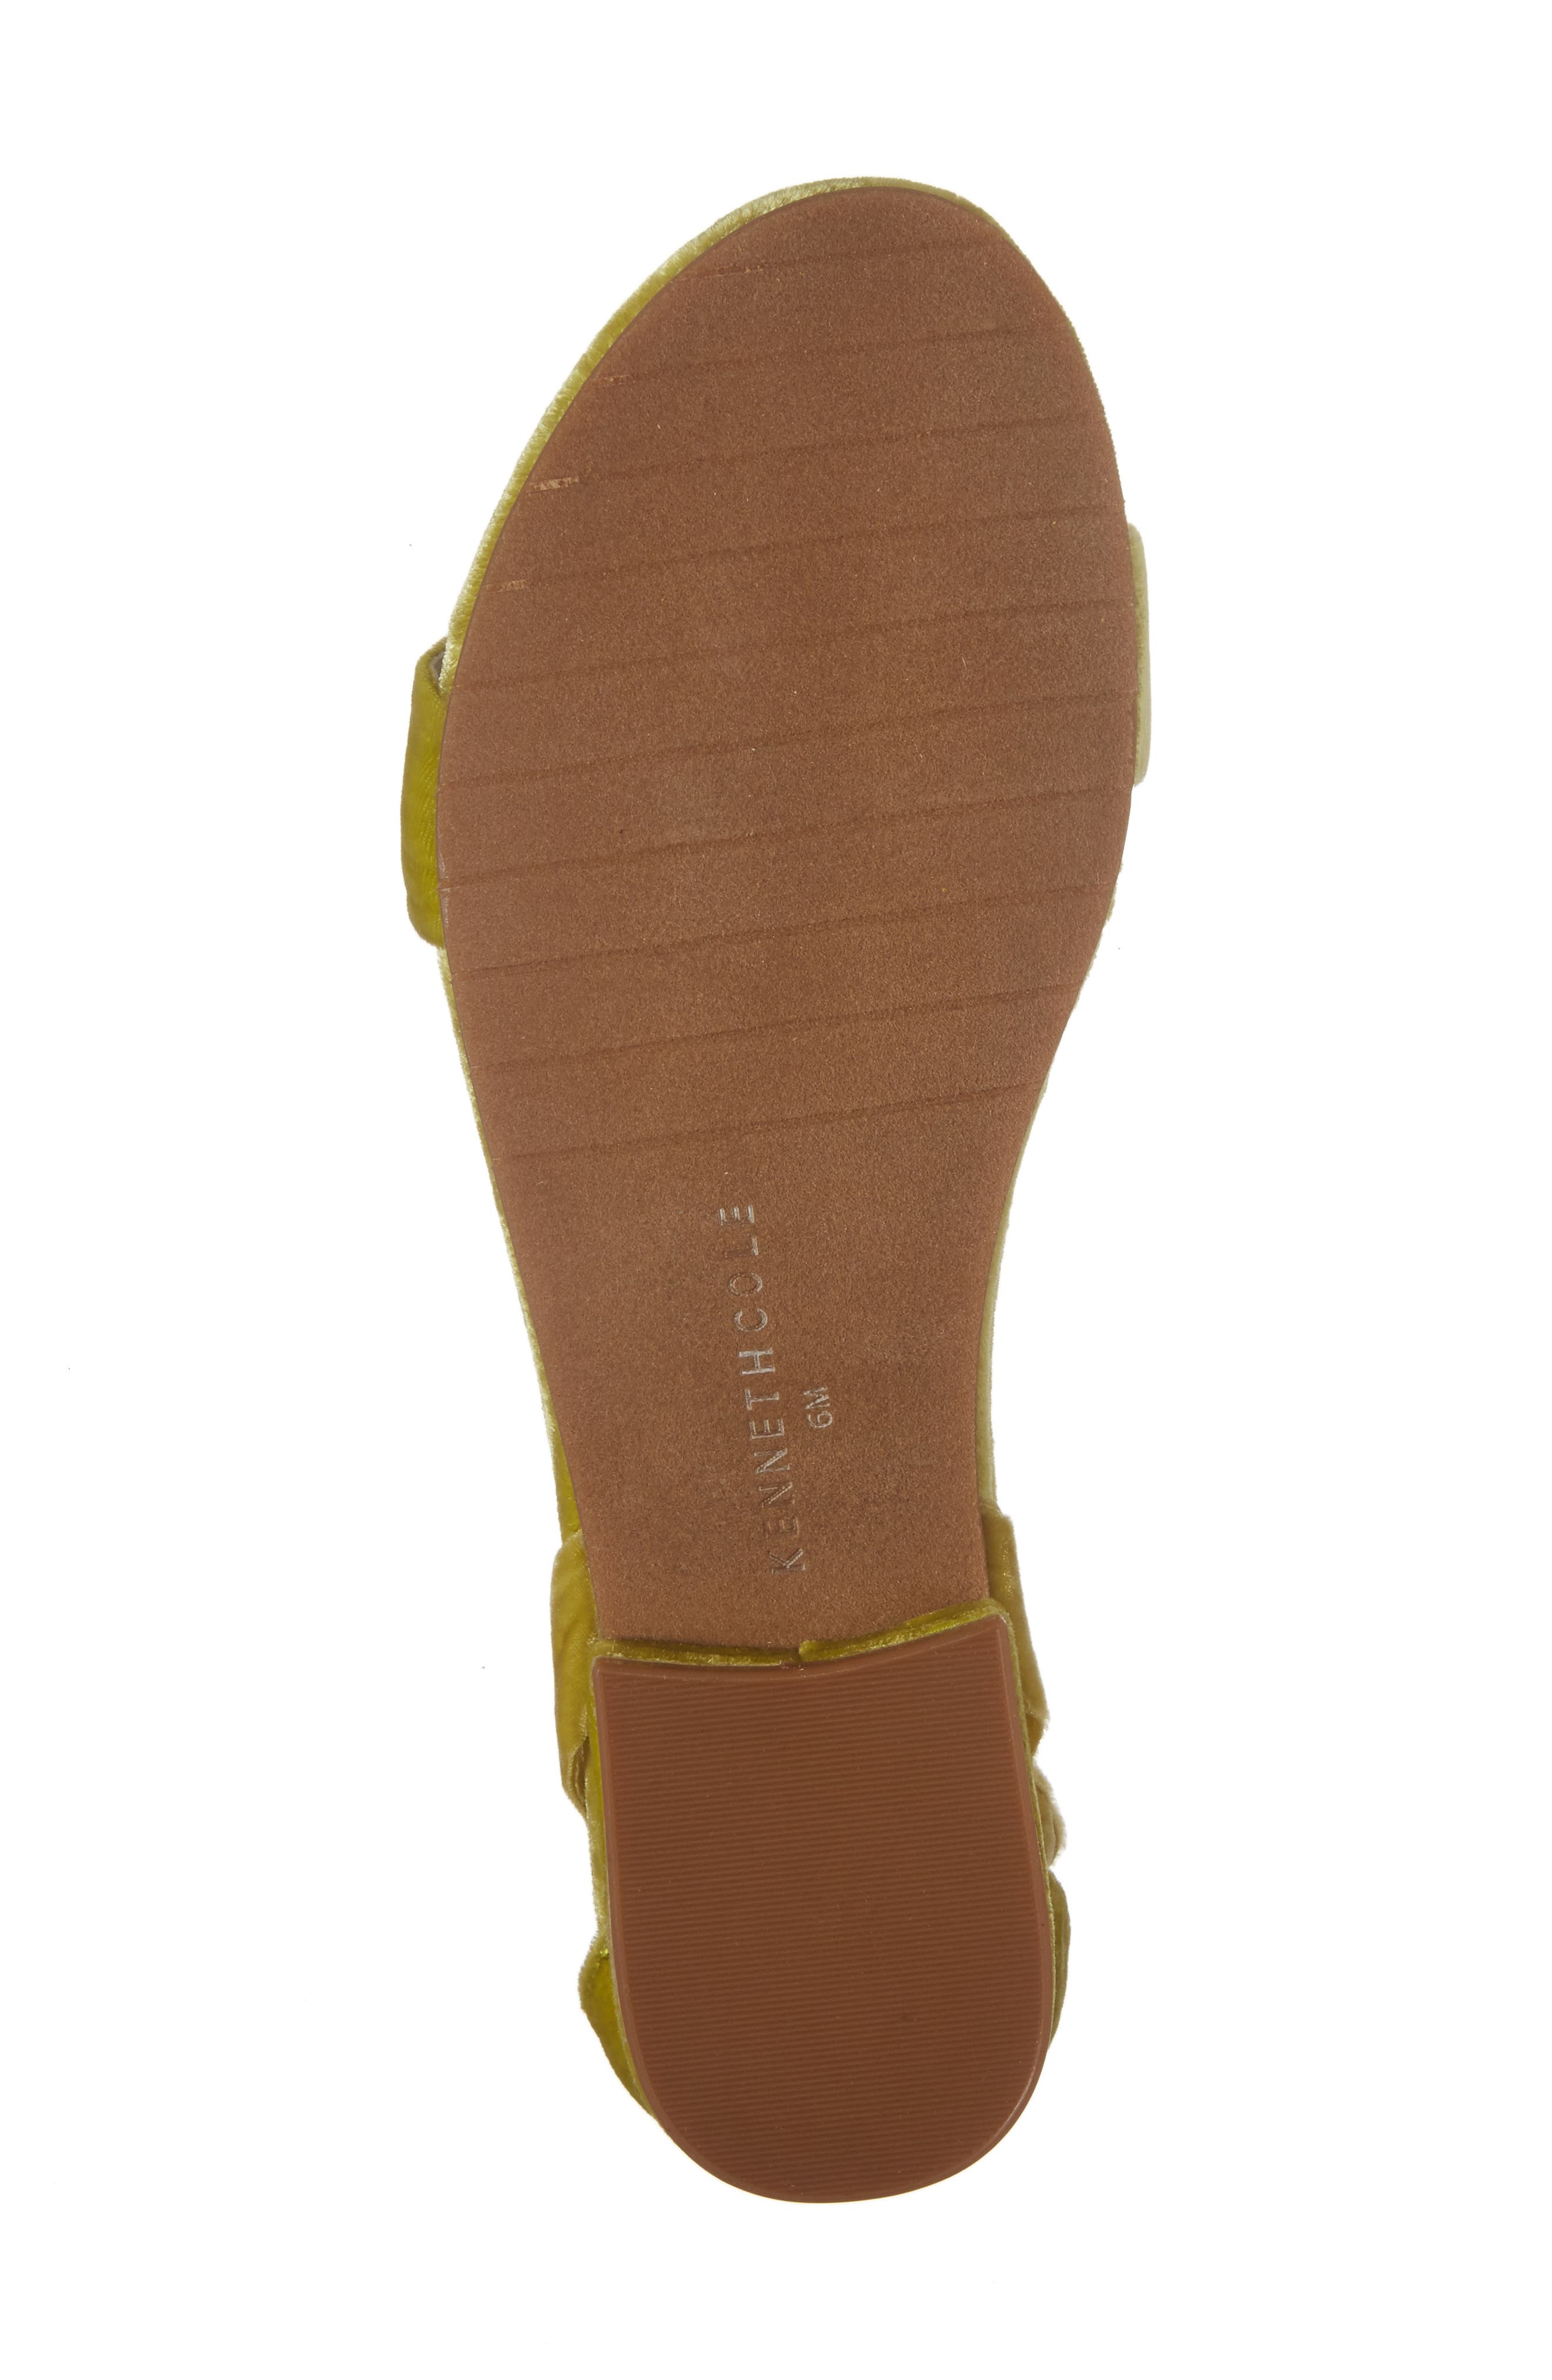 Valen Tassel Lace-Up Sandal,                             Alternate thumbnail 74, color,